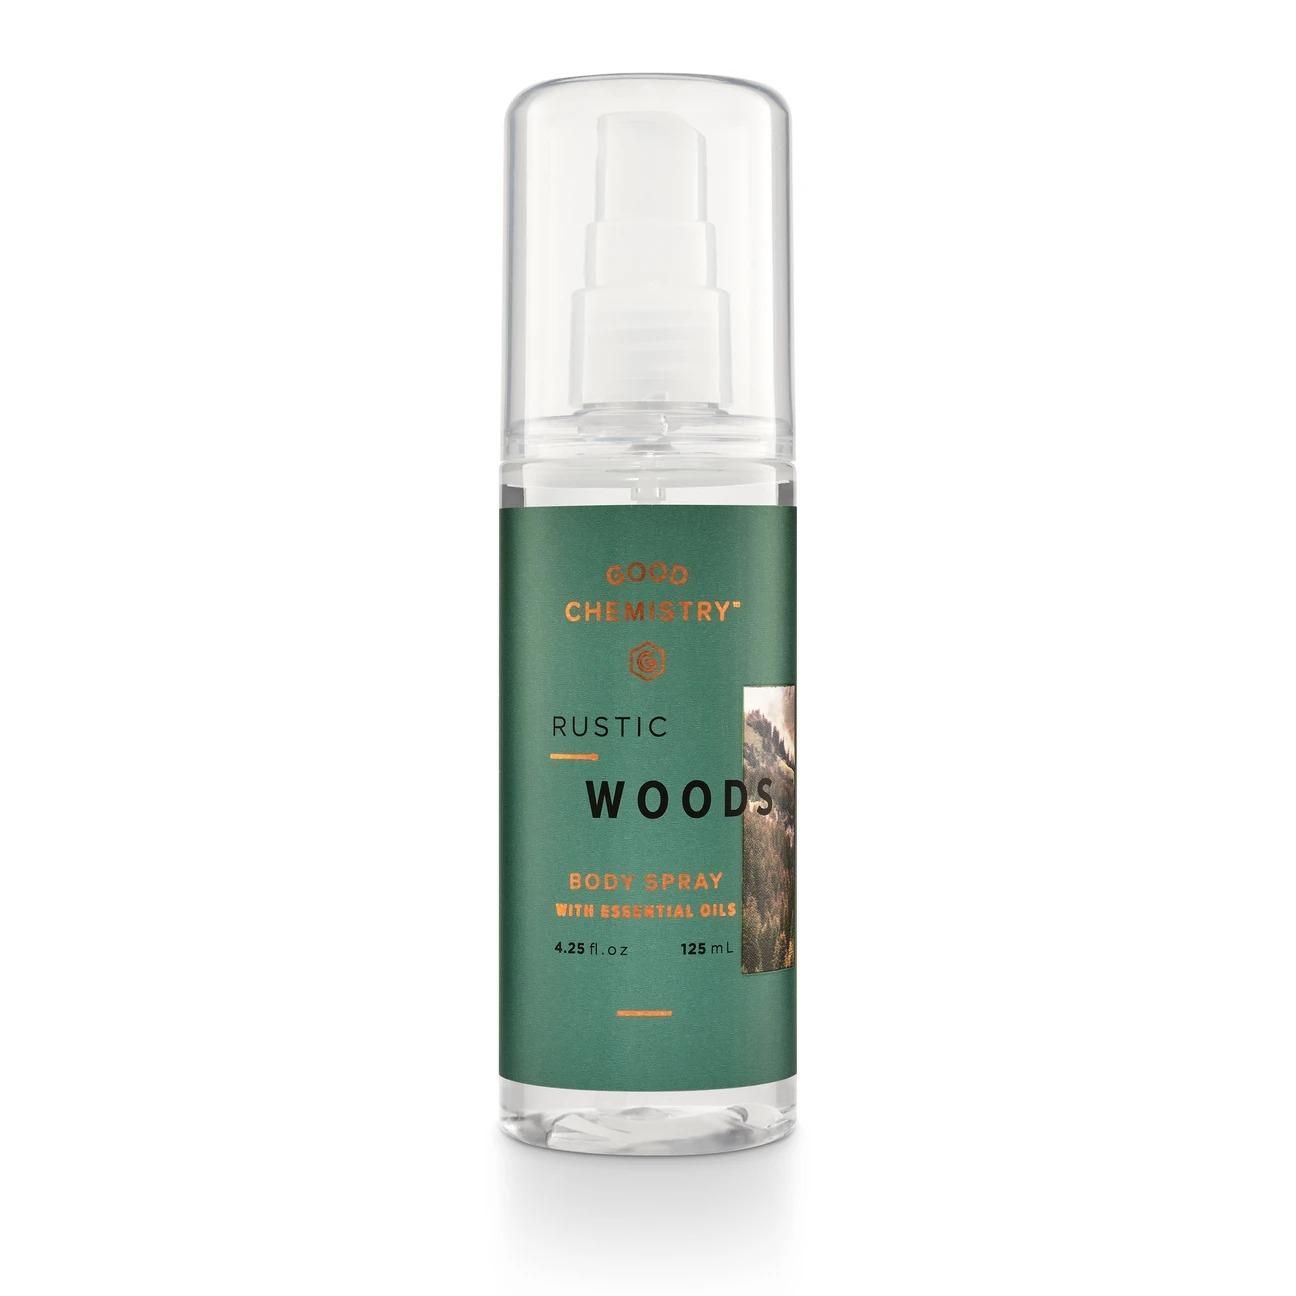 Good Chemistry Rustic Woods Body Spray